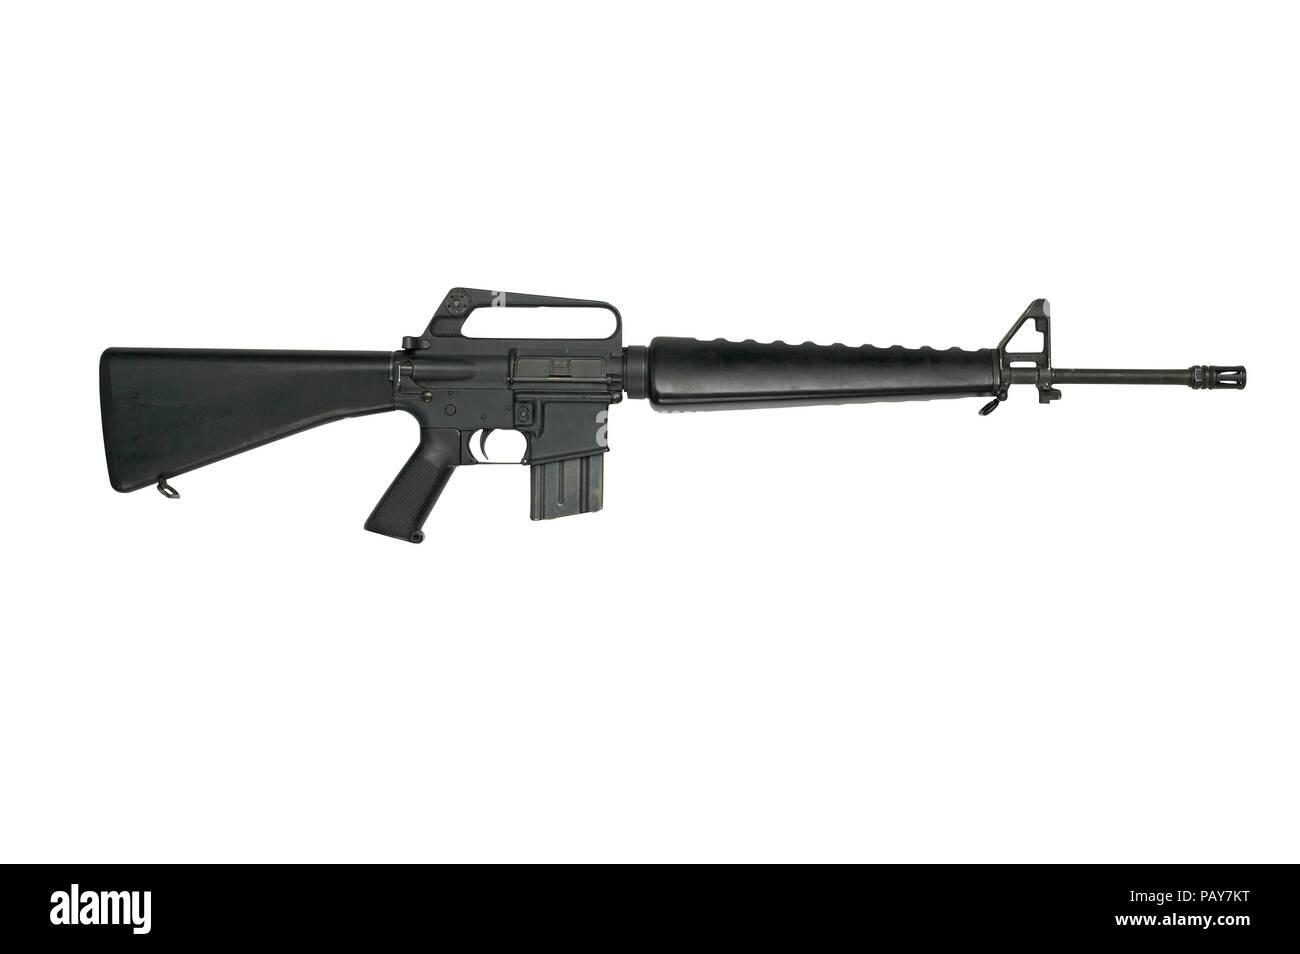 Colt Armalite M16A1 Rifle - Stock Image